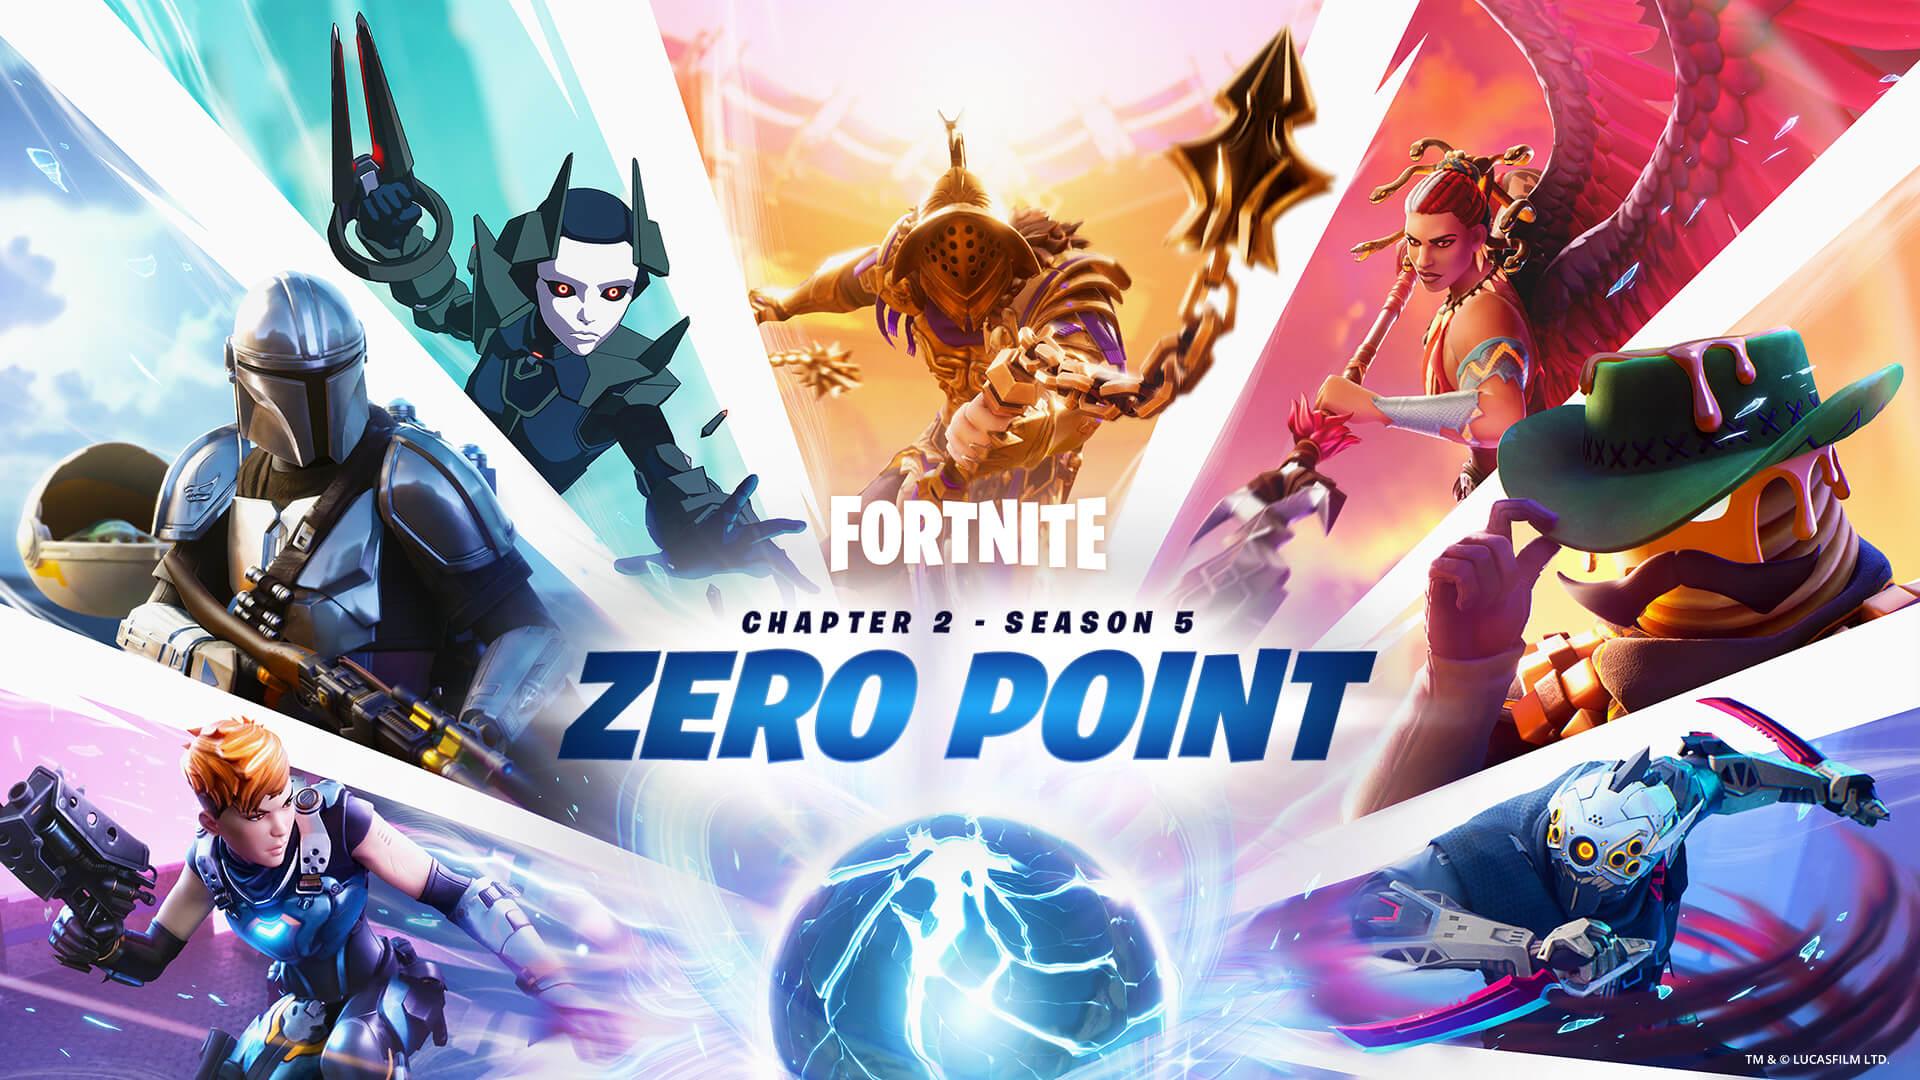 Fortnite Chapter 2 Season 5 Battle Pass